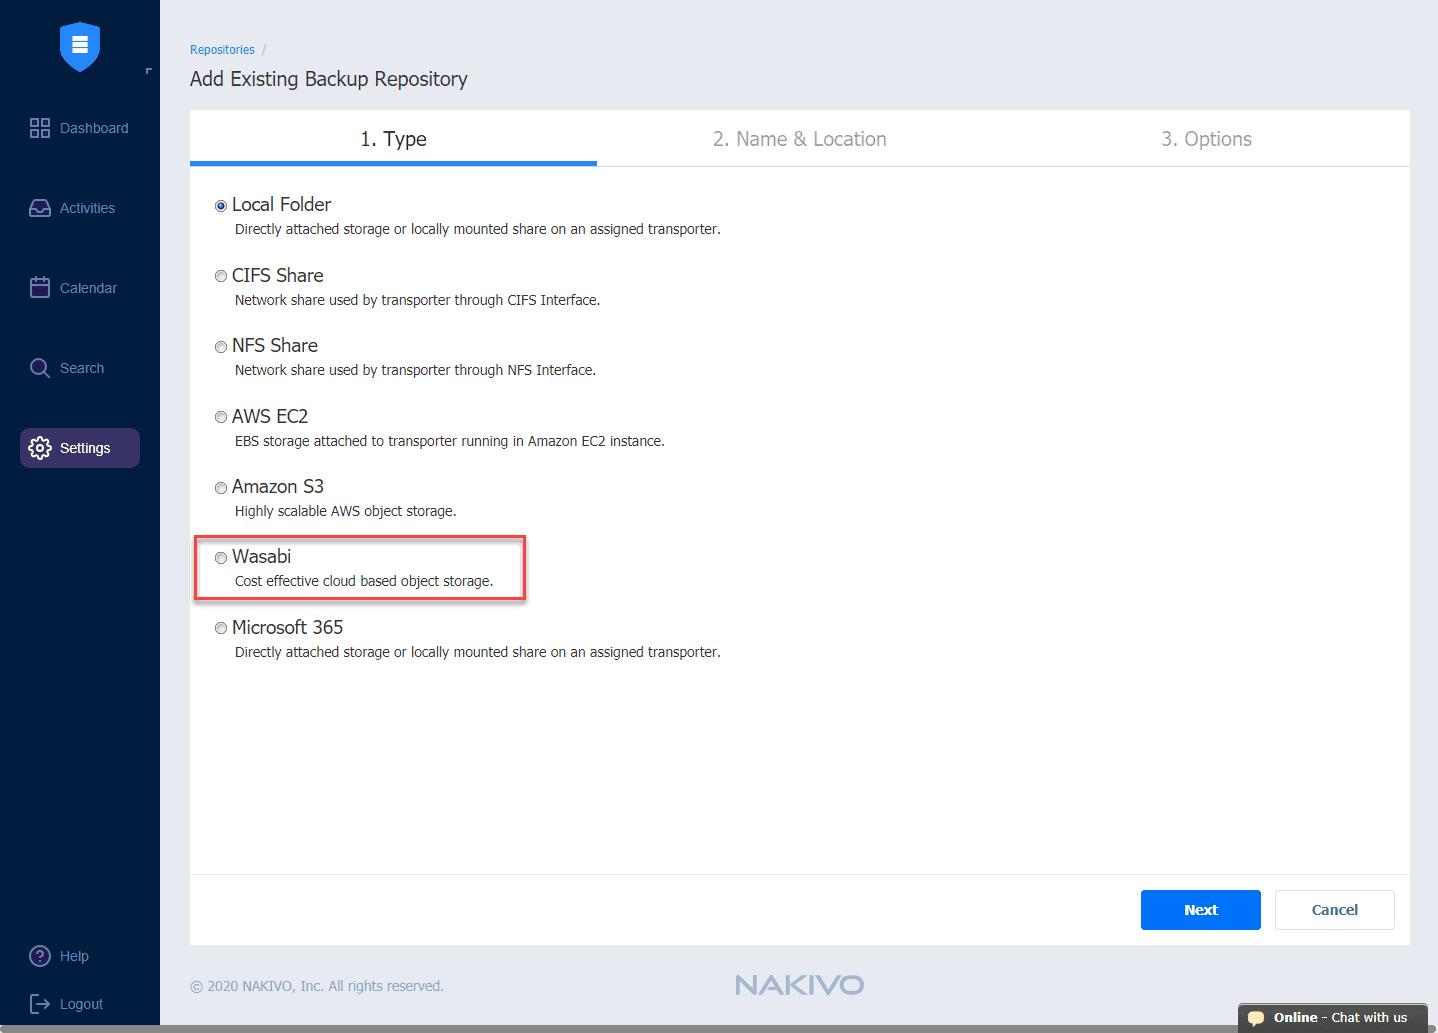 Wasabi-backup-repository-added-in-NAKIVO-Backup-Replication-v10-beta